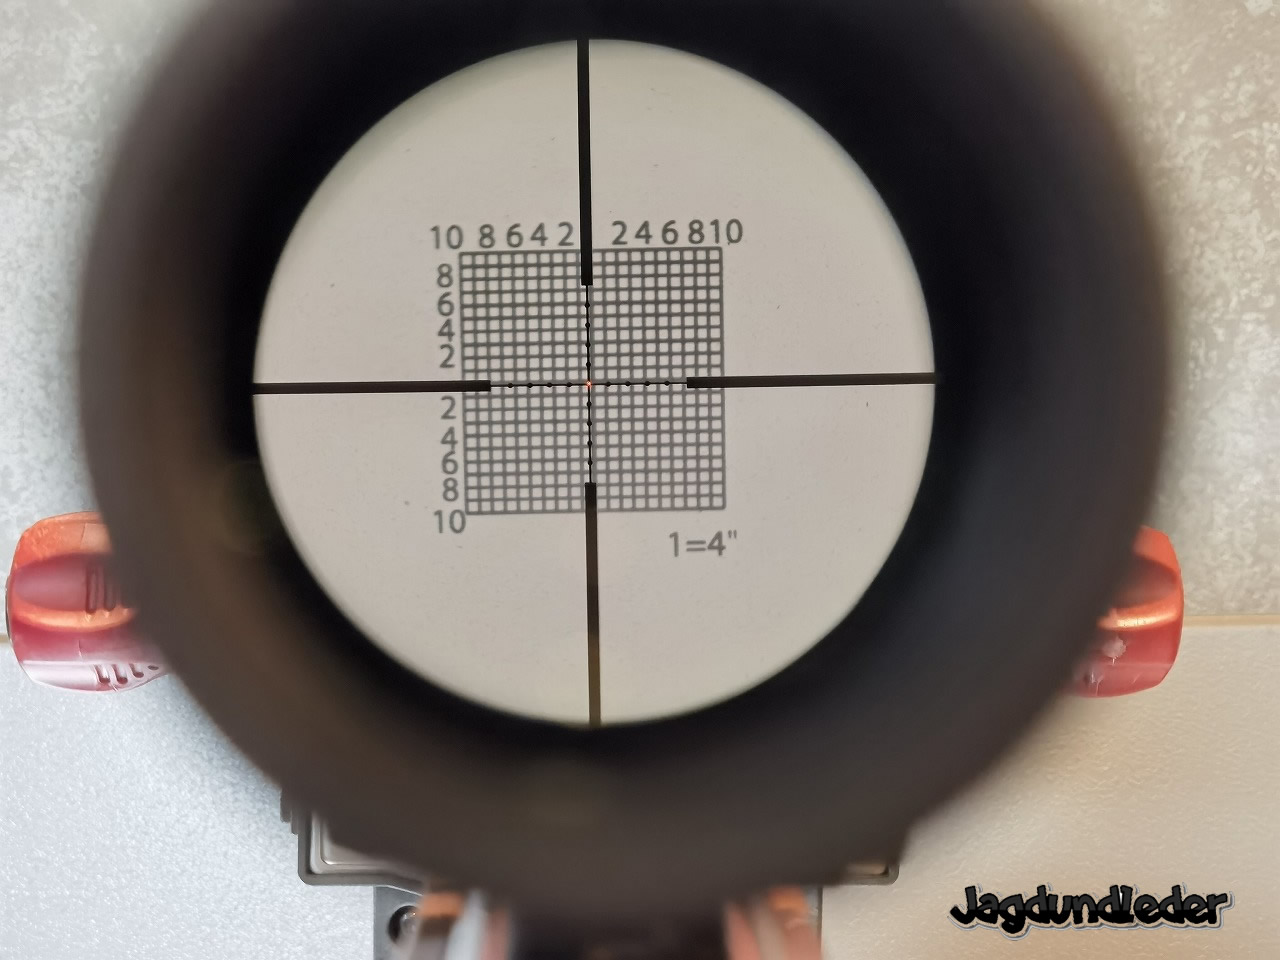 Vixen 6-24x58 ボアサイターでボアサイト